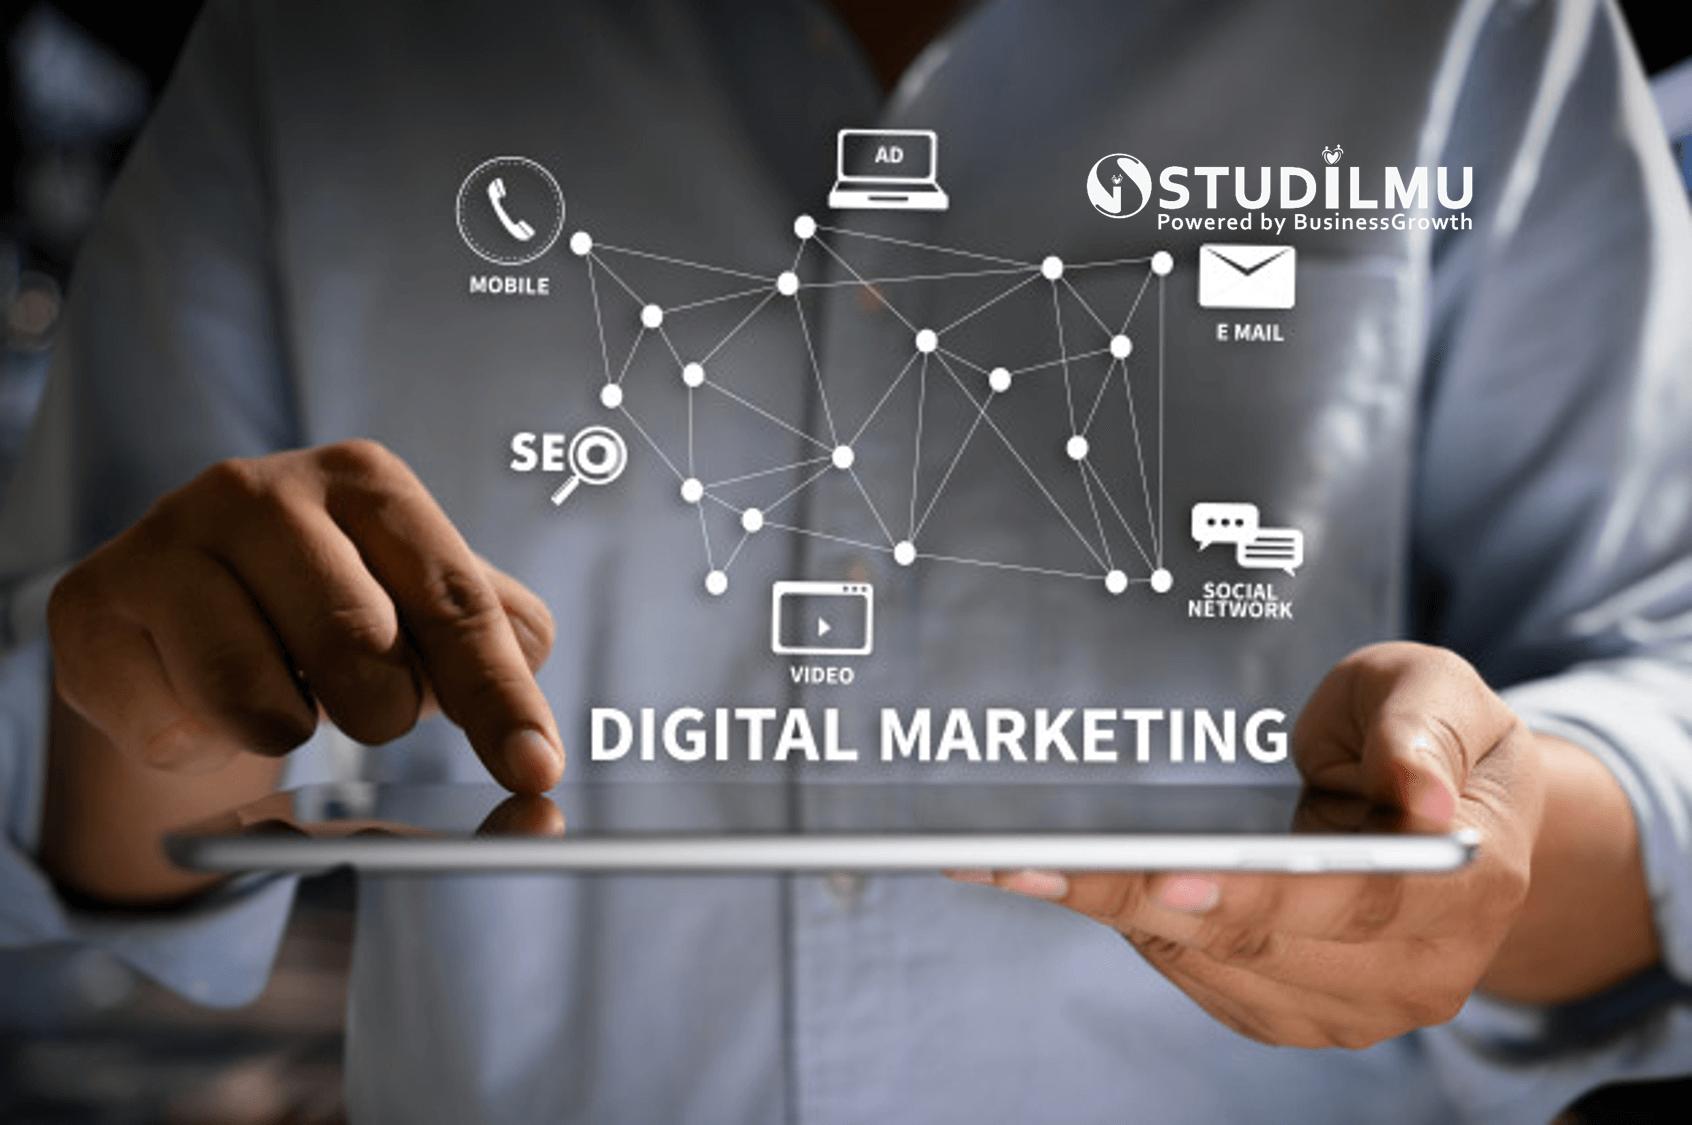 STUDILMU Career Advice - 10 Alasan Mengapa Digital Marketing Sangat Penting